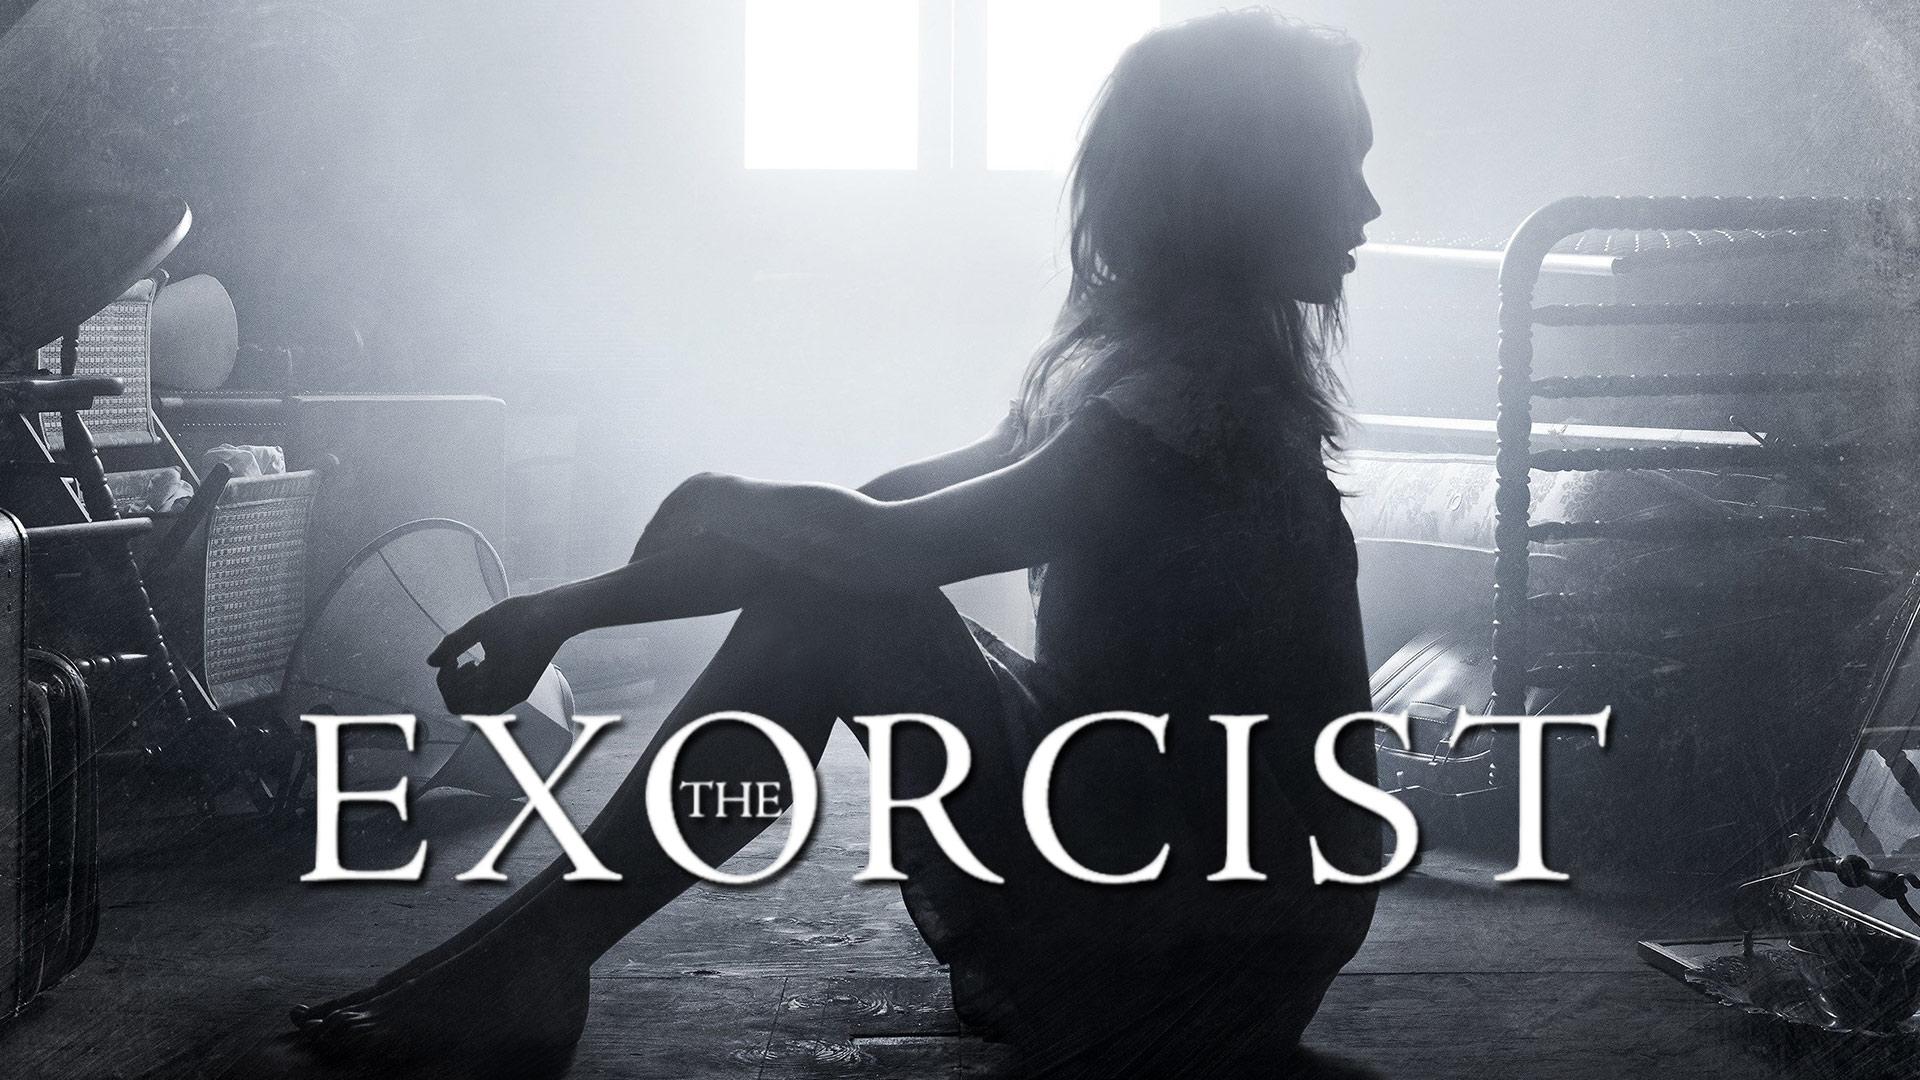 The Exorcist Season 1